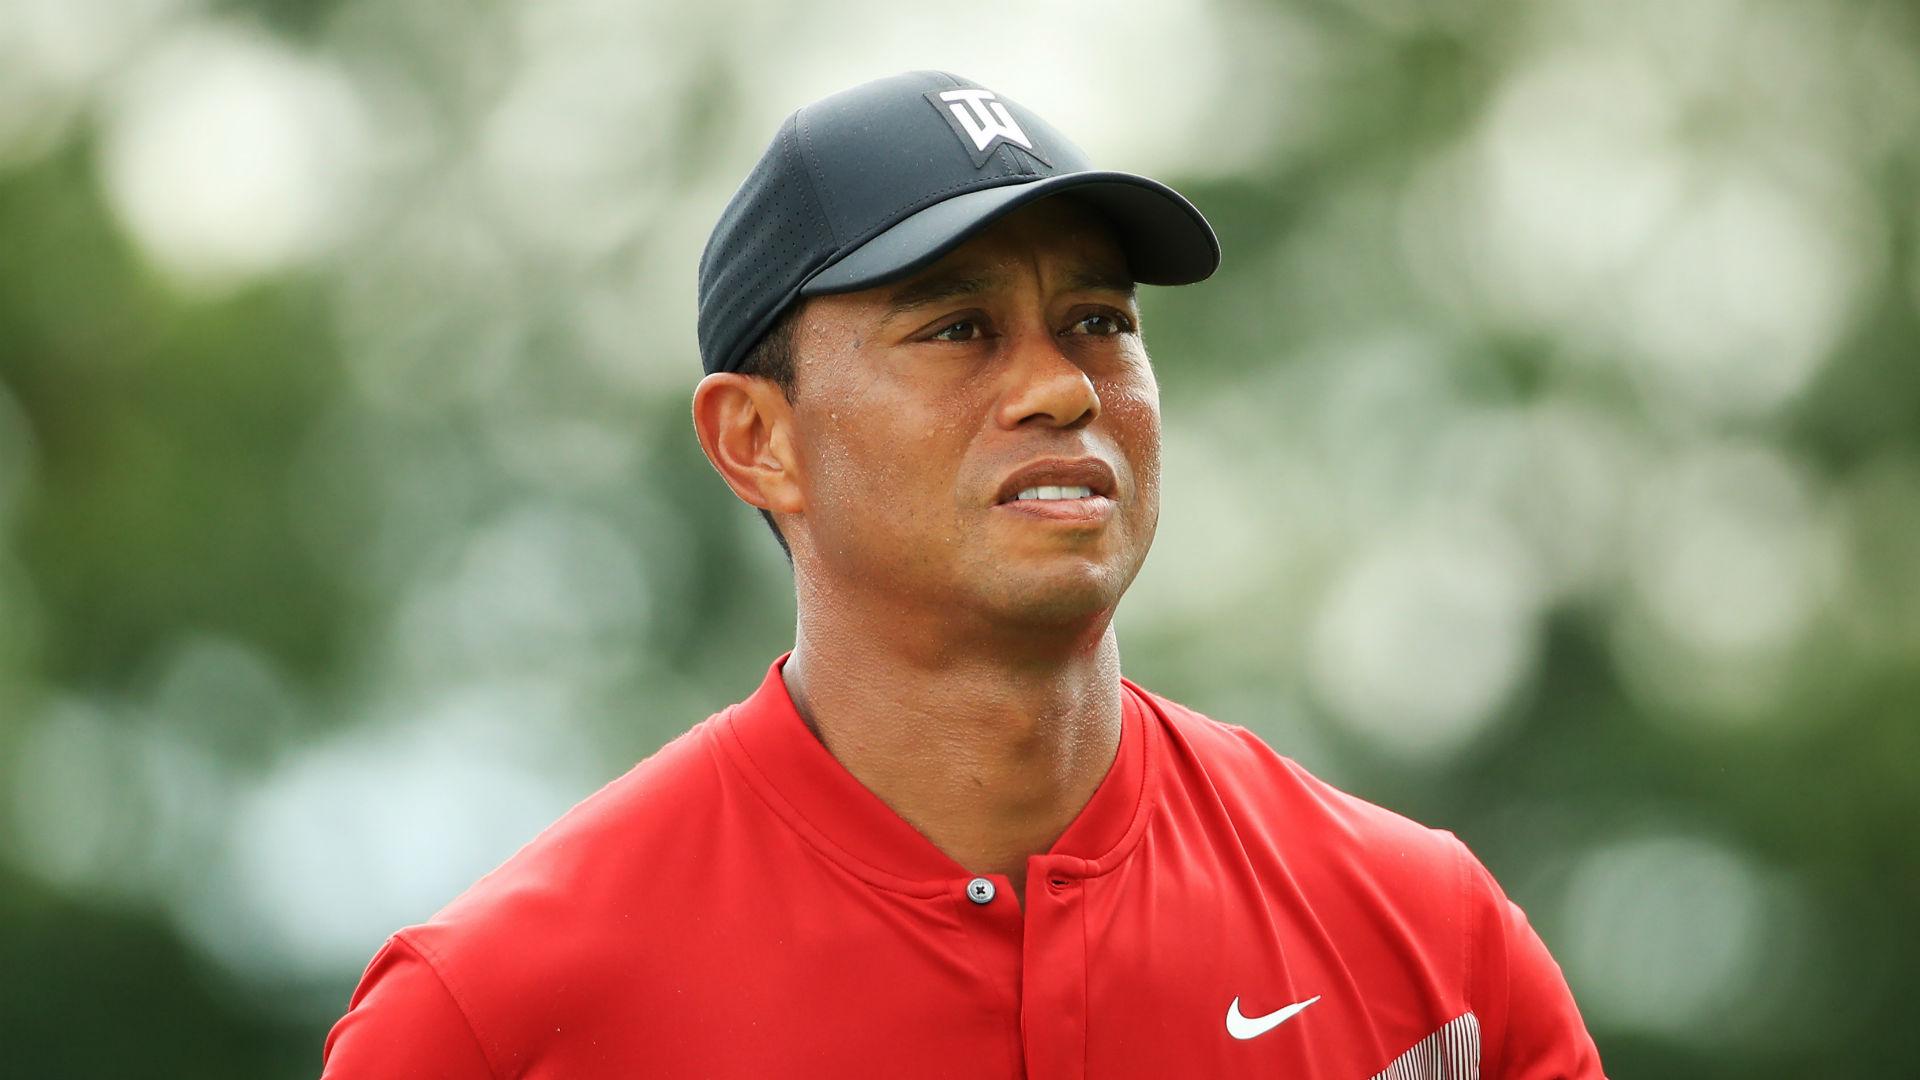 Tiger Woods reveals he underwent minor knee surgery